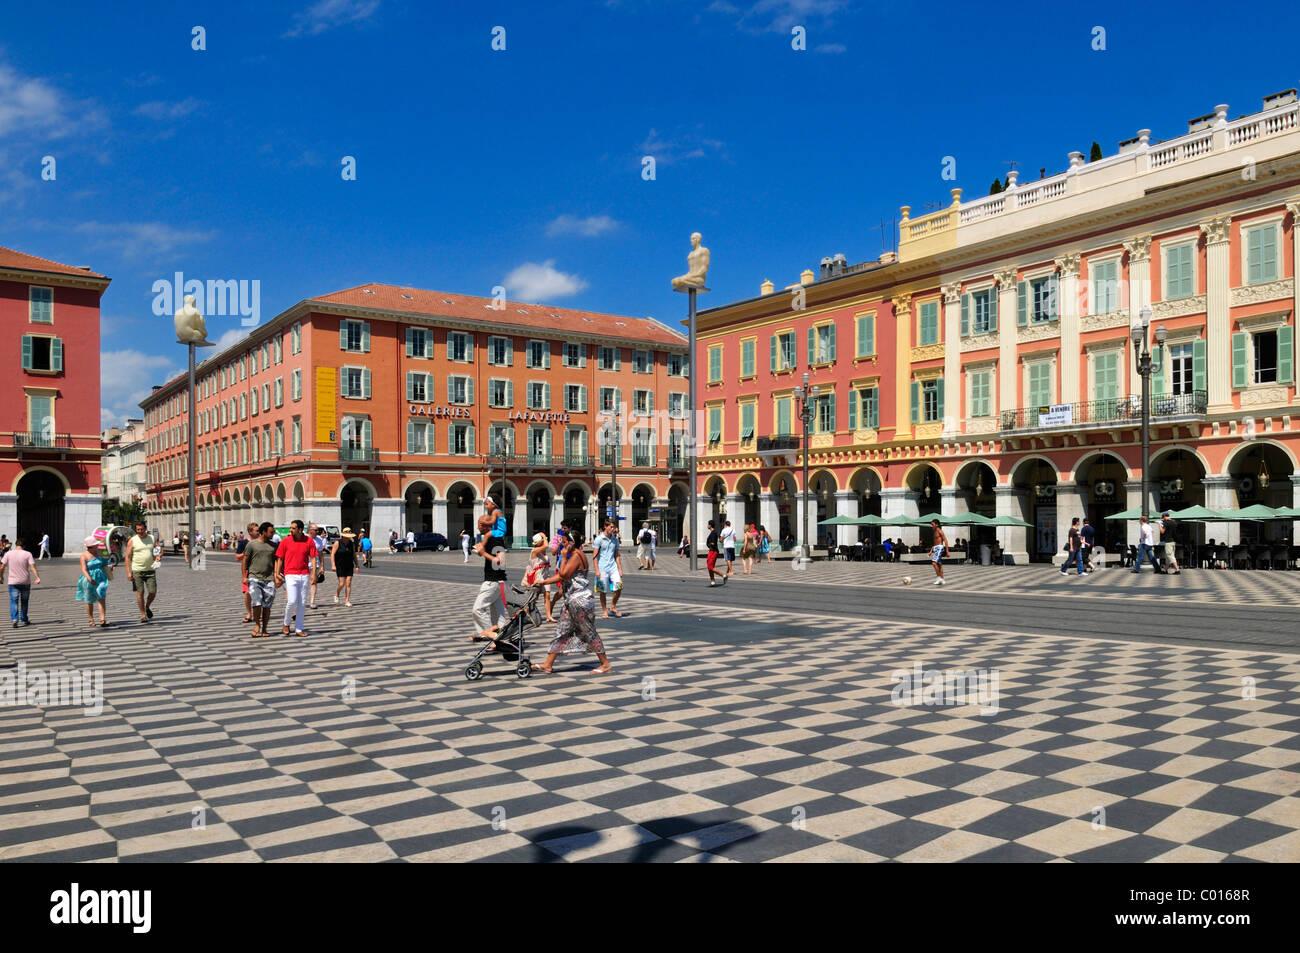 Place Massena, Nice, Nizza, Cote d'Azur, Alpes Maritimes, Provence, France, Europe - Stock Image